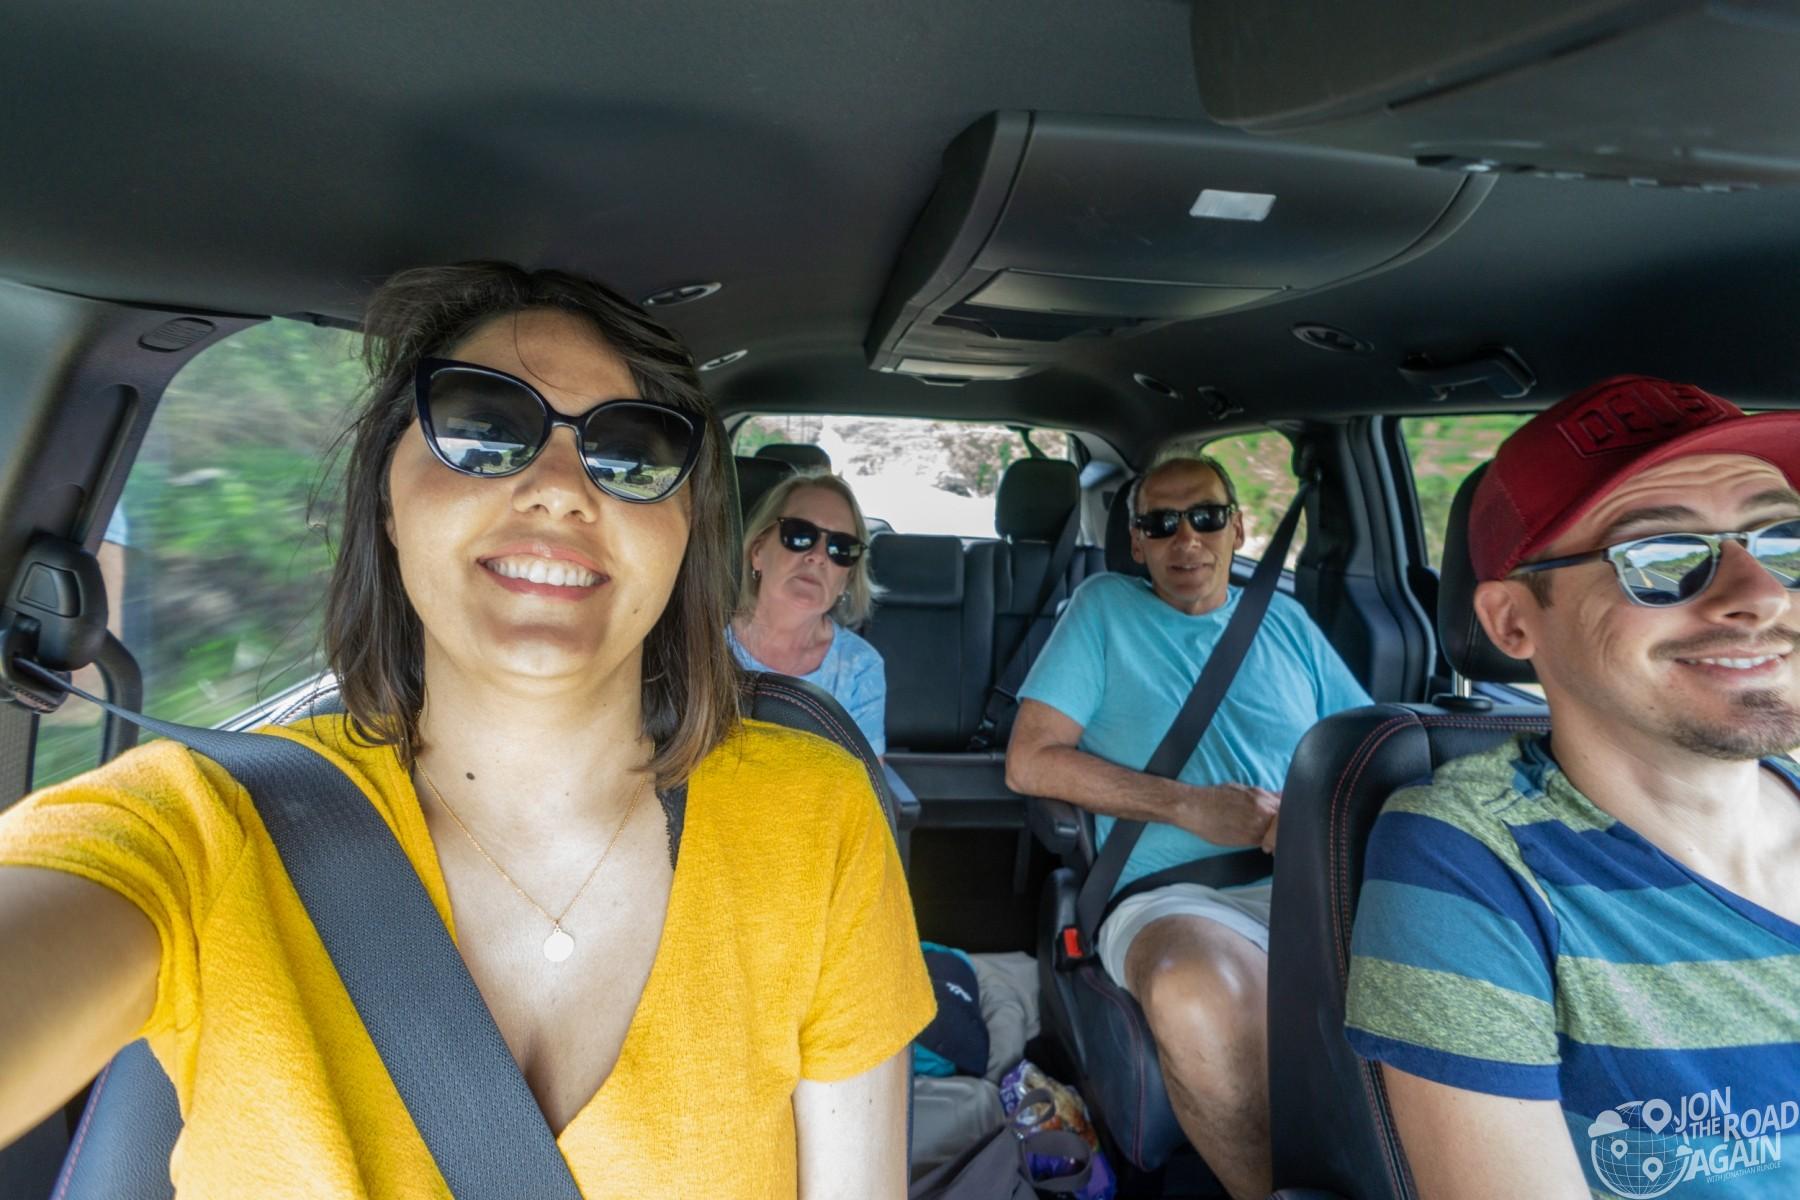 Family in the minivan